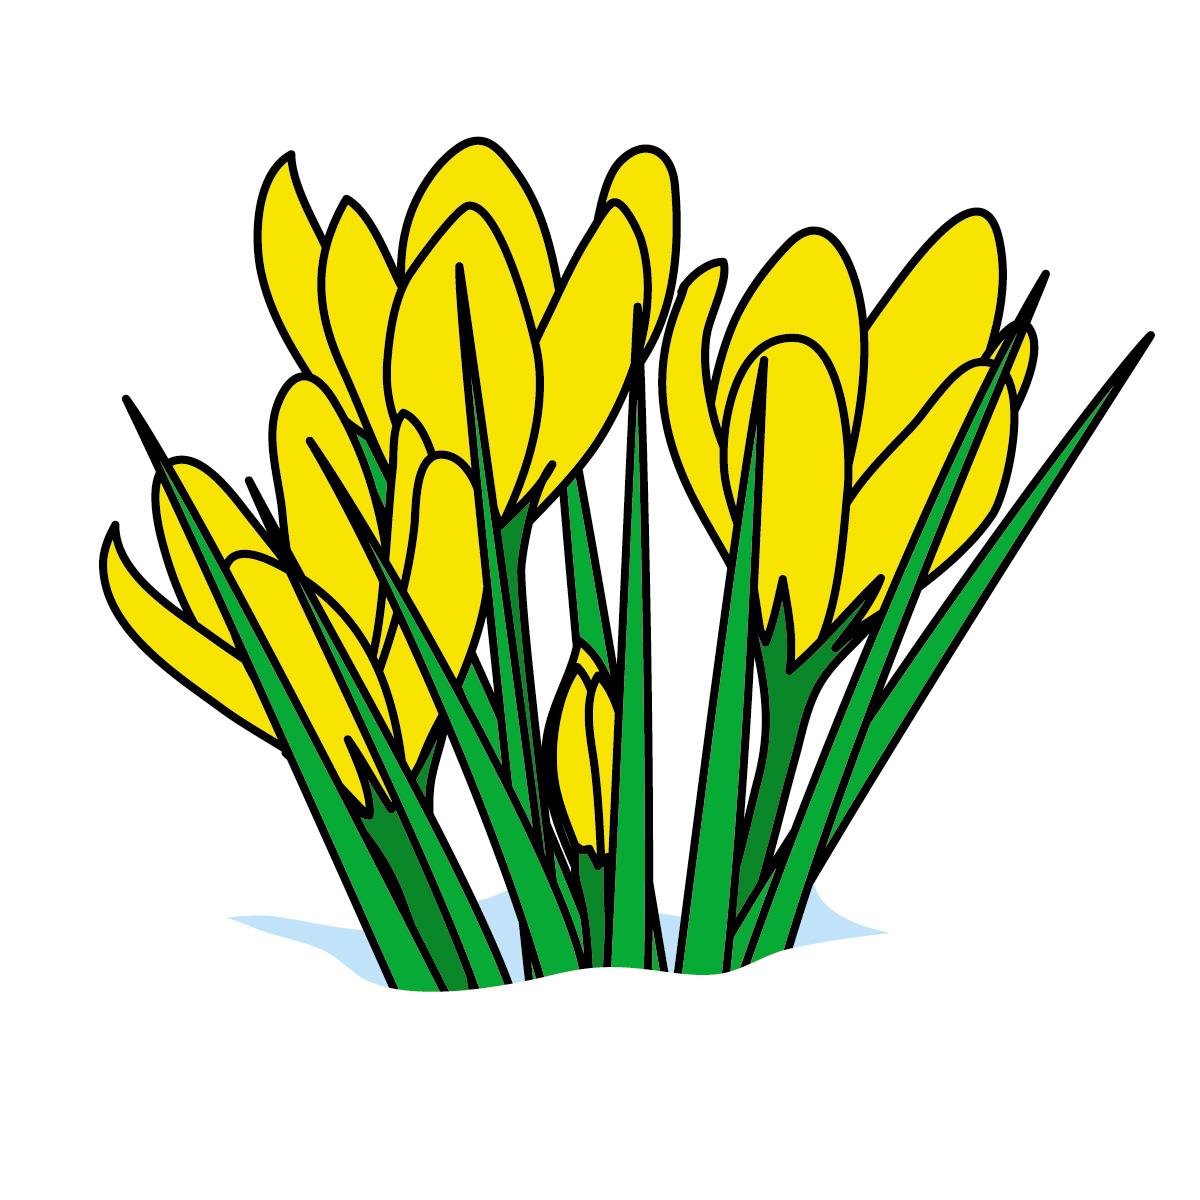 1200x1200 Clip Art Images Yellow Flower Clip